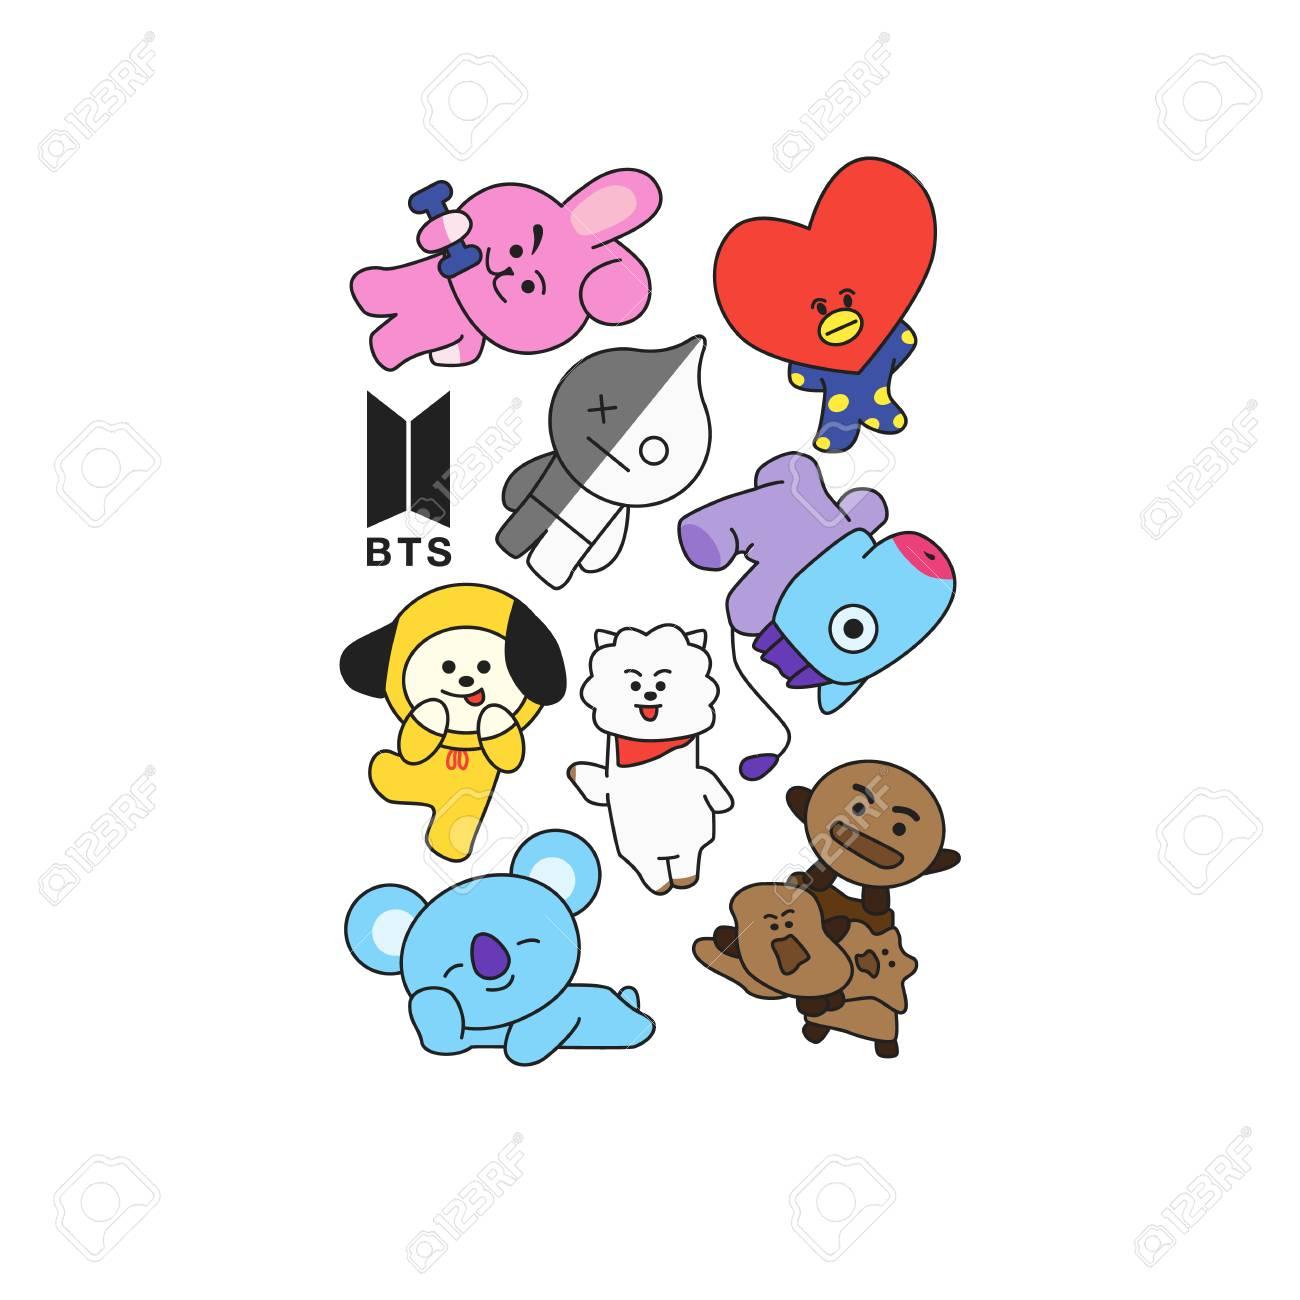 BTS - South Korean boy band. Print for t-shirts. - 117995149